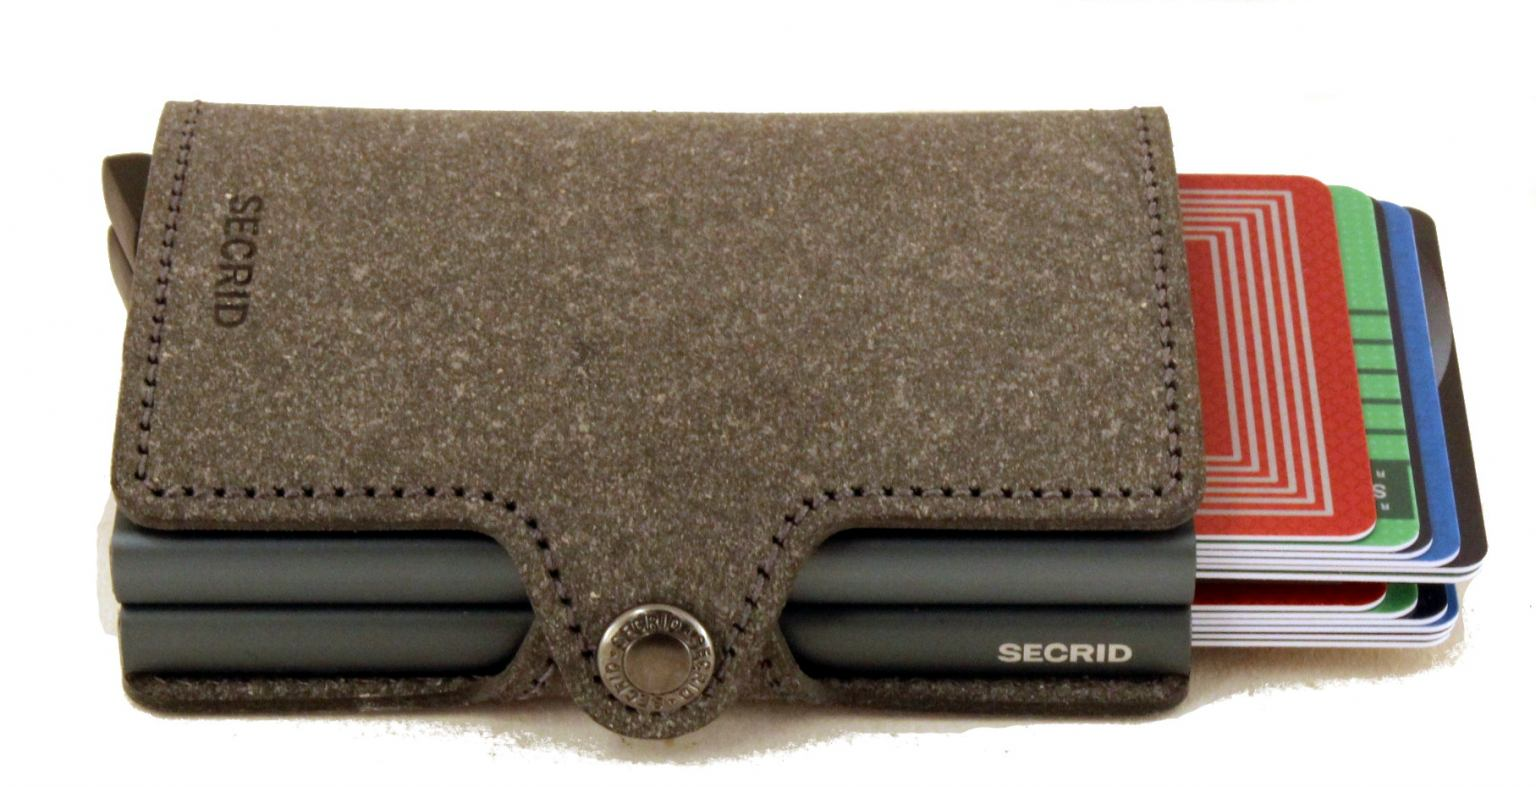 Secrid Twinwallet Kartenetui mit zwei Metallhüllen Crisple Black